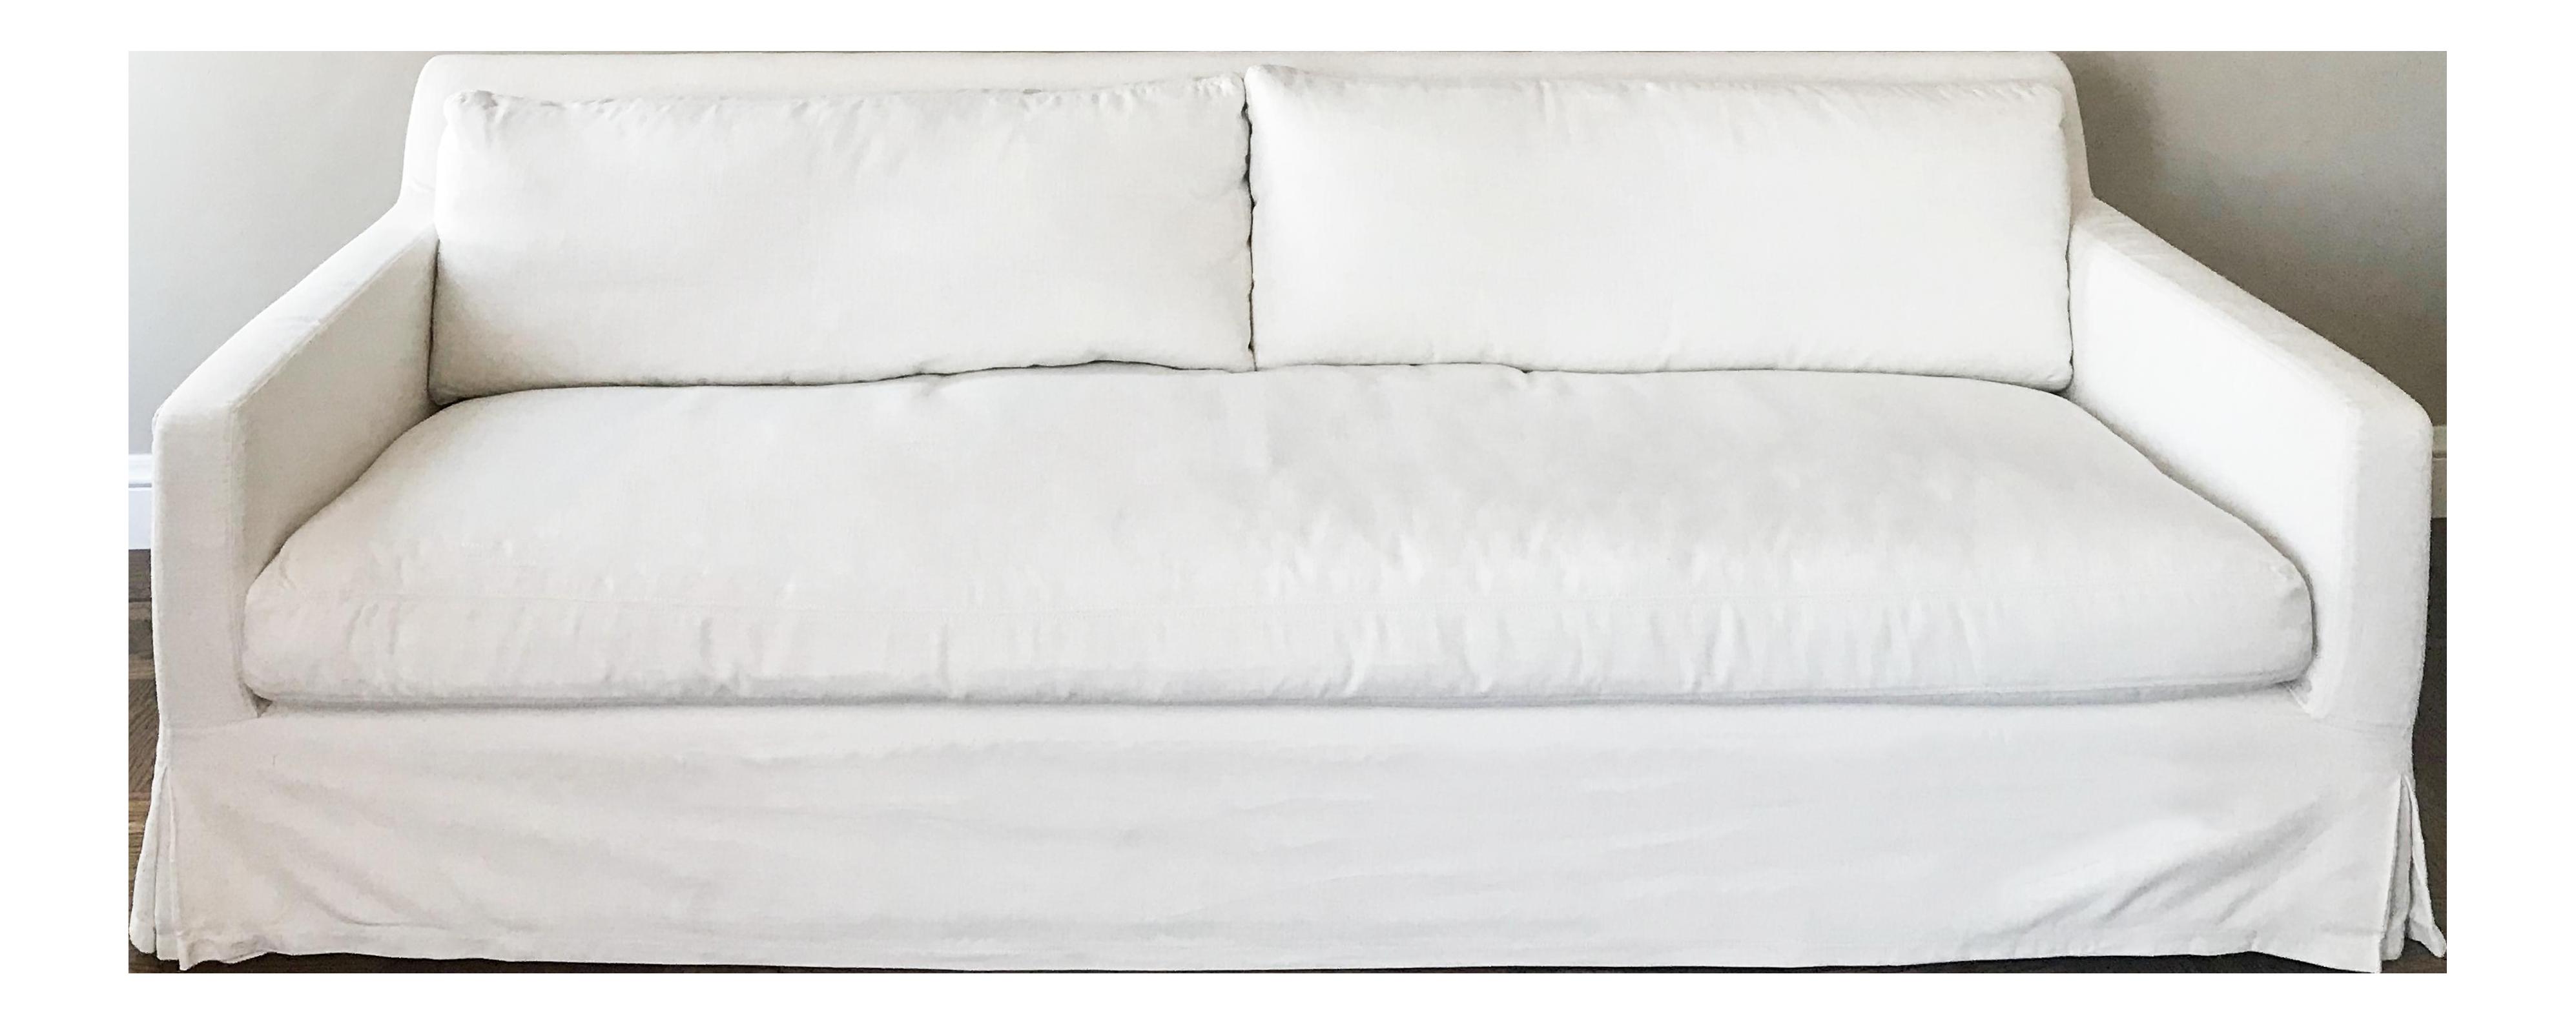 Restoration Hardware Sofa (Belgian Track Arm Slipcovered 7u0027 In White  Perennials Fabric!)